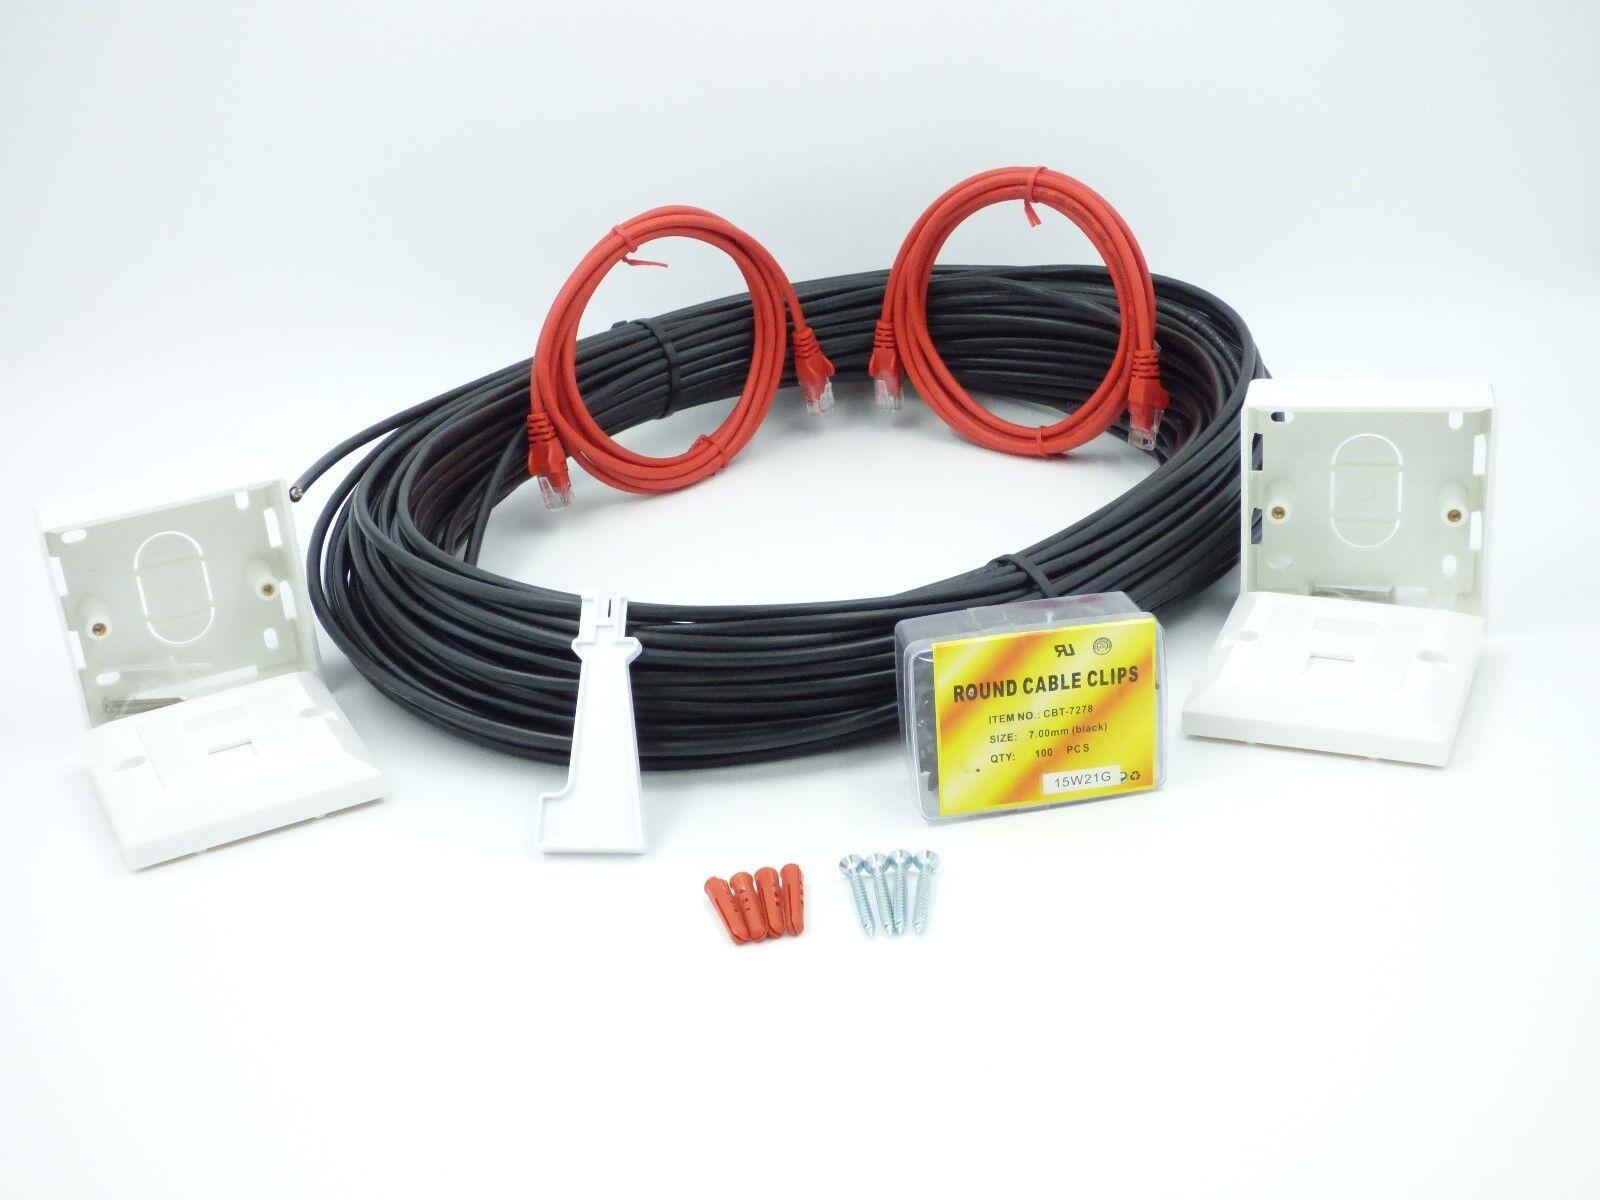 15 MTR Cat6 External Network Extension kit Ethernet cable Kit 100% COPPER